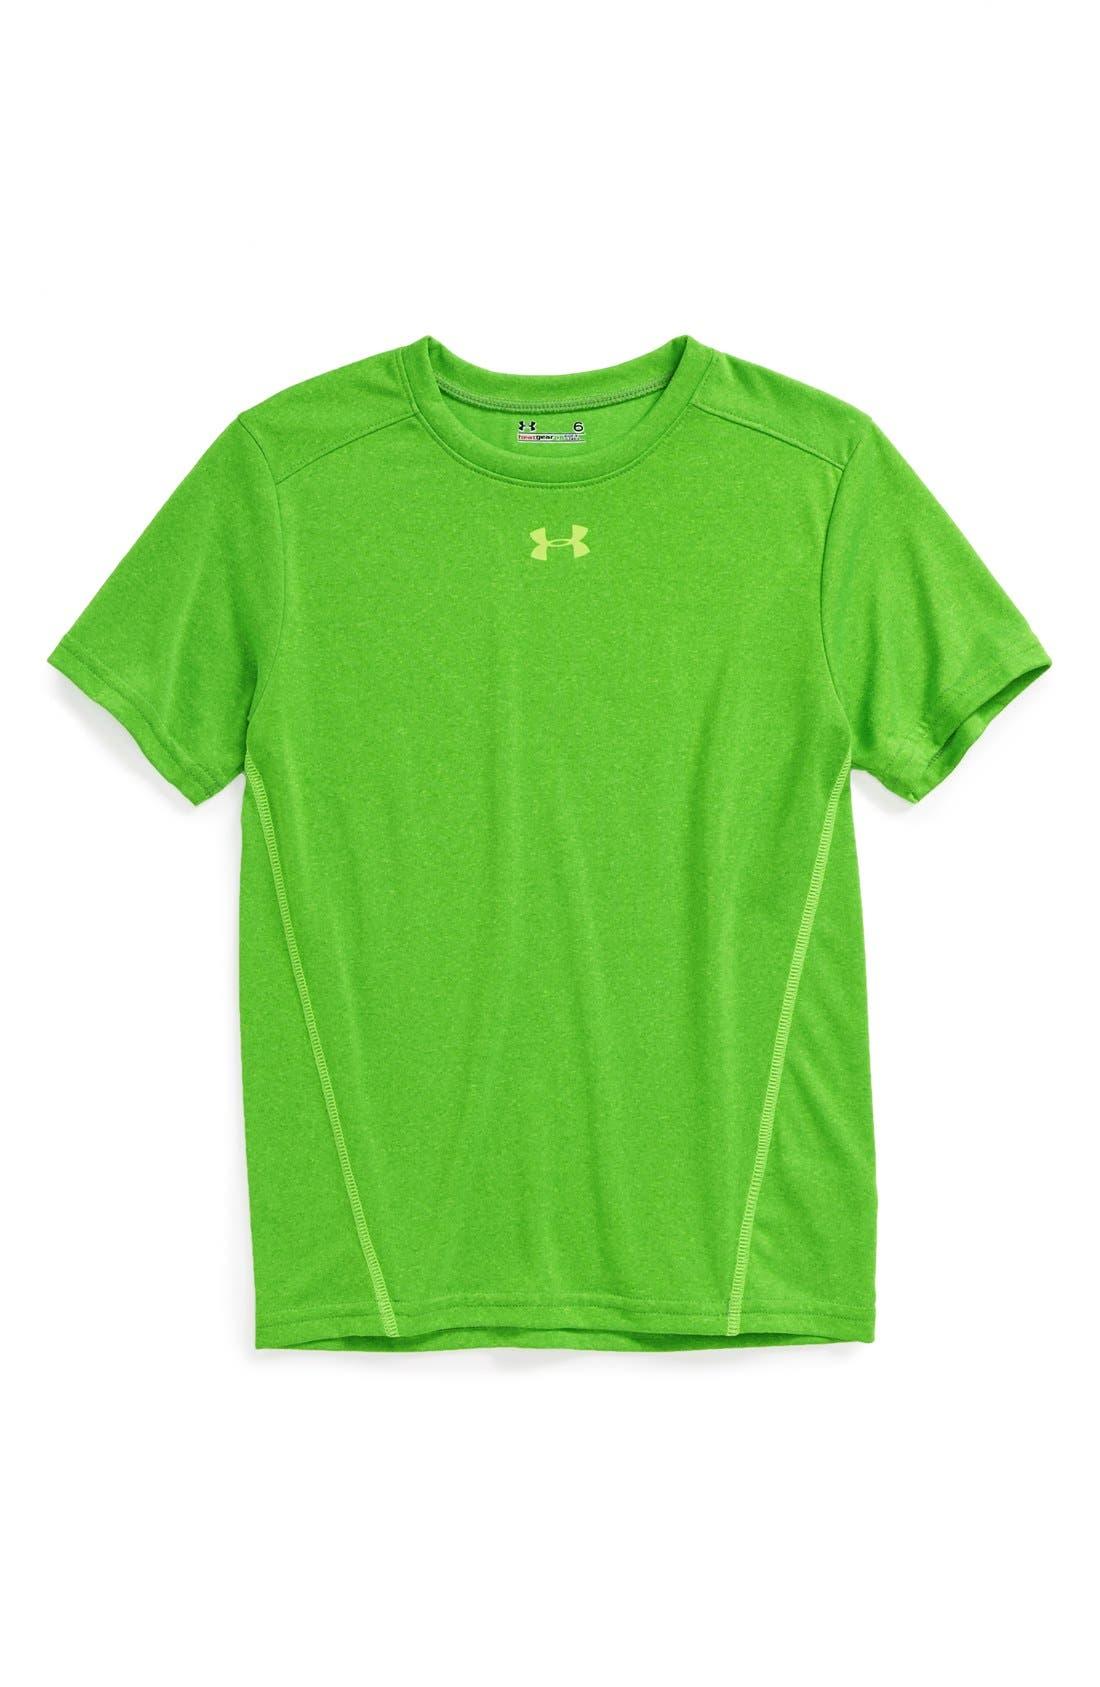 Main Image - Under Armour 'Comingled' HeatGear® T-Shirt (Little Boys)